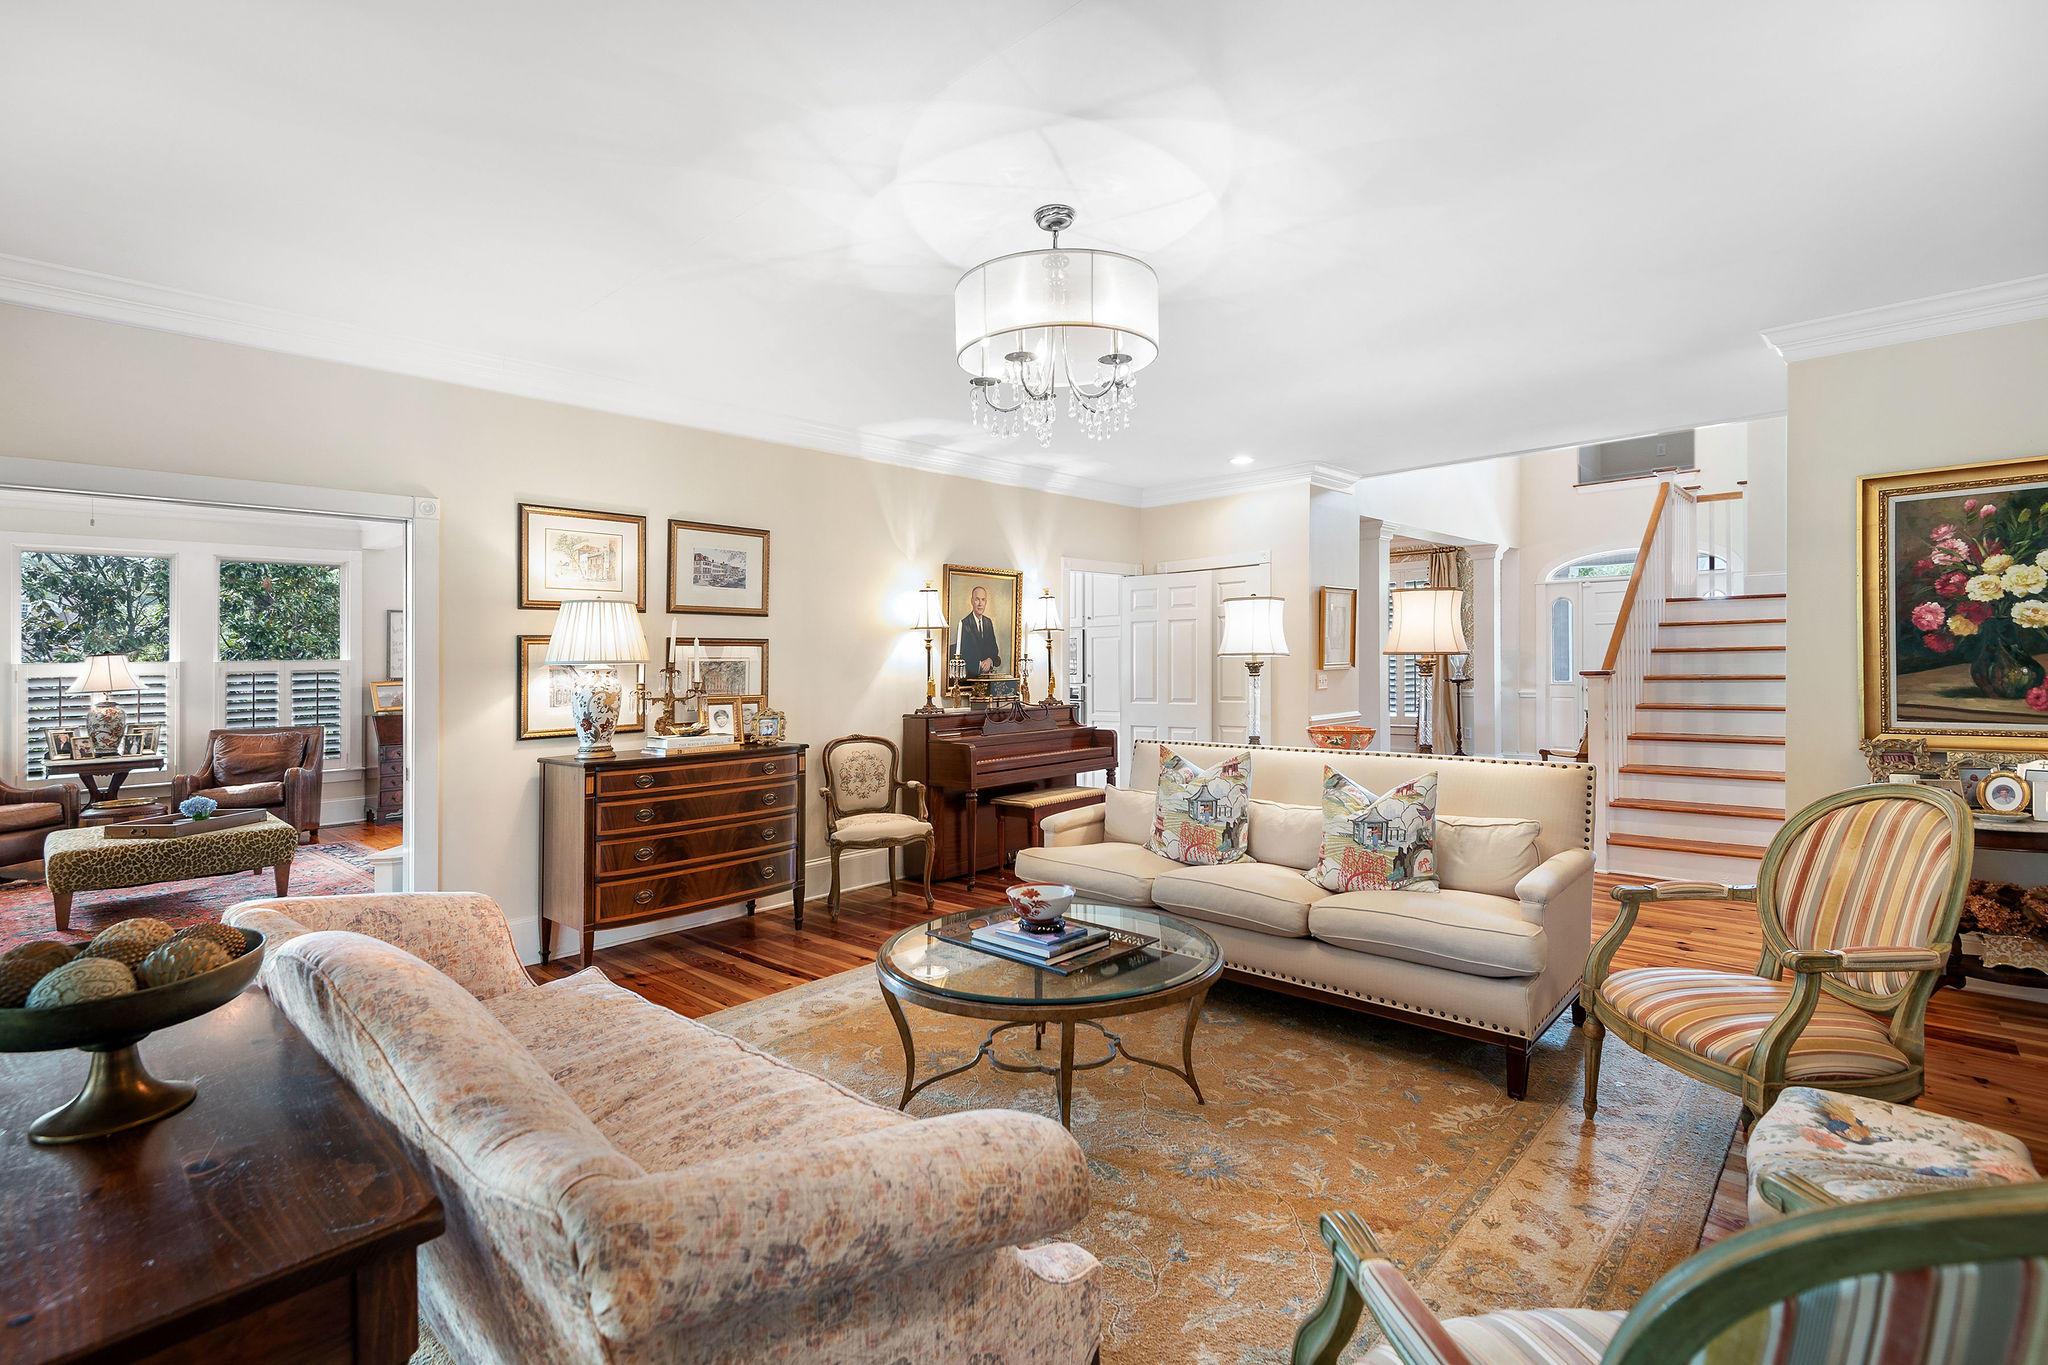 Country Club II Homes For Sale - 1482 Burningtree, Charleston, SC - 64